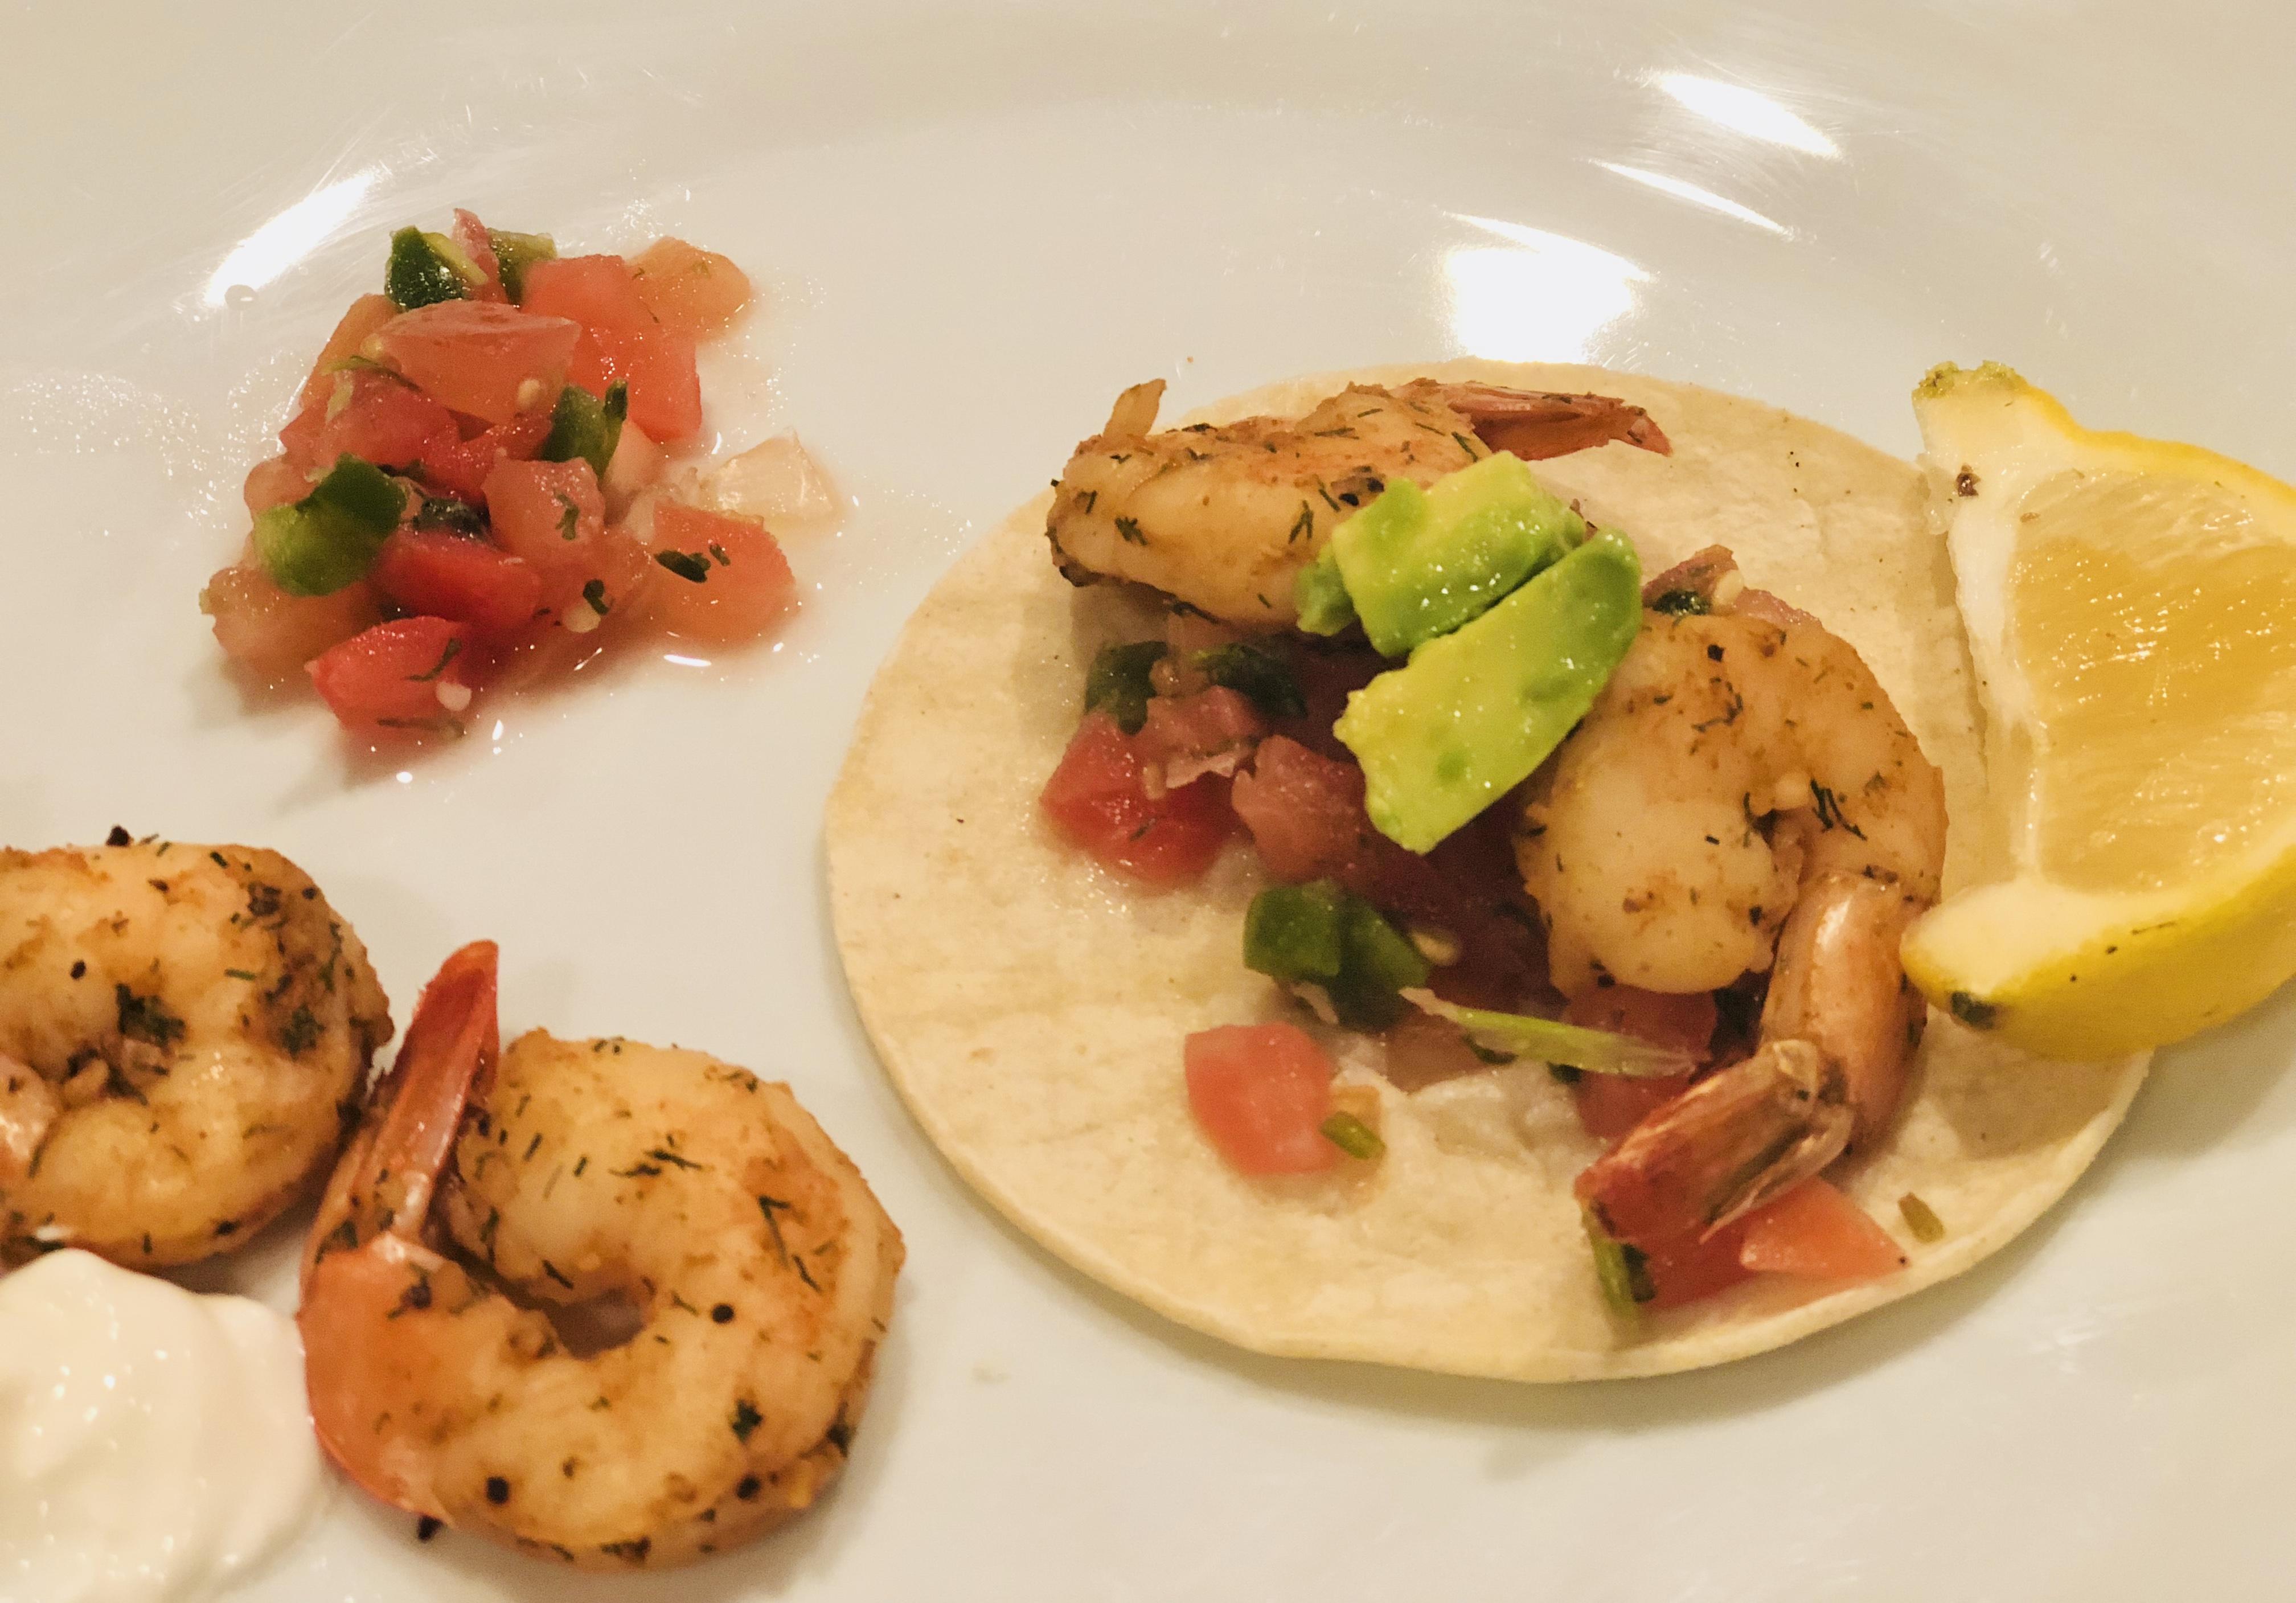 Spicy Shrimp Tacos with Avocado